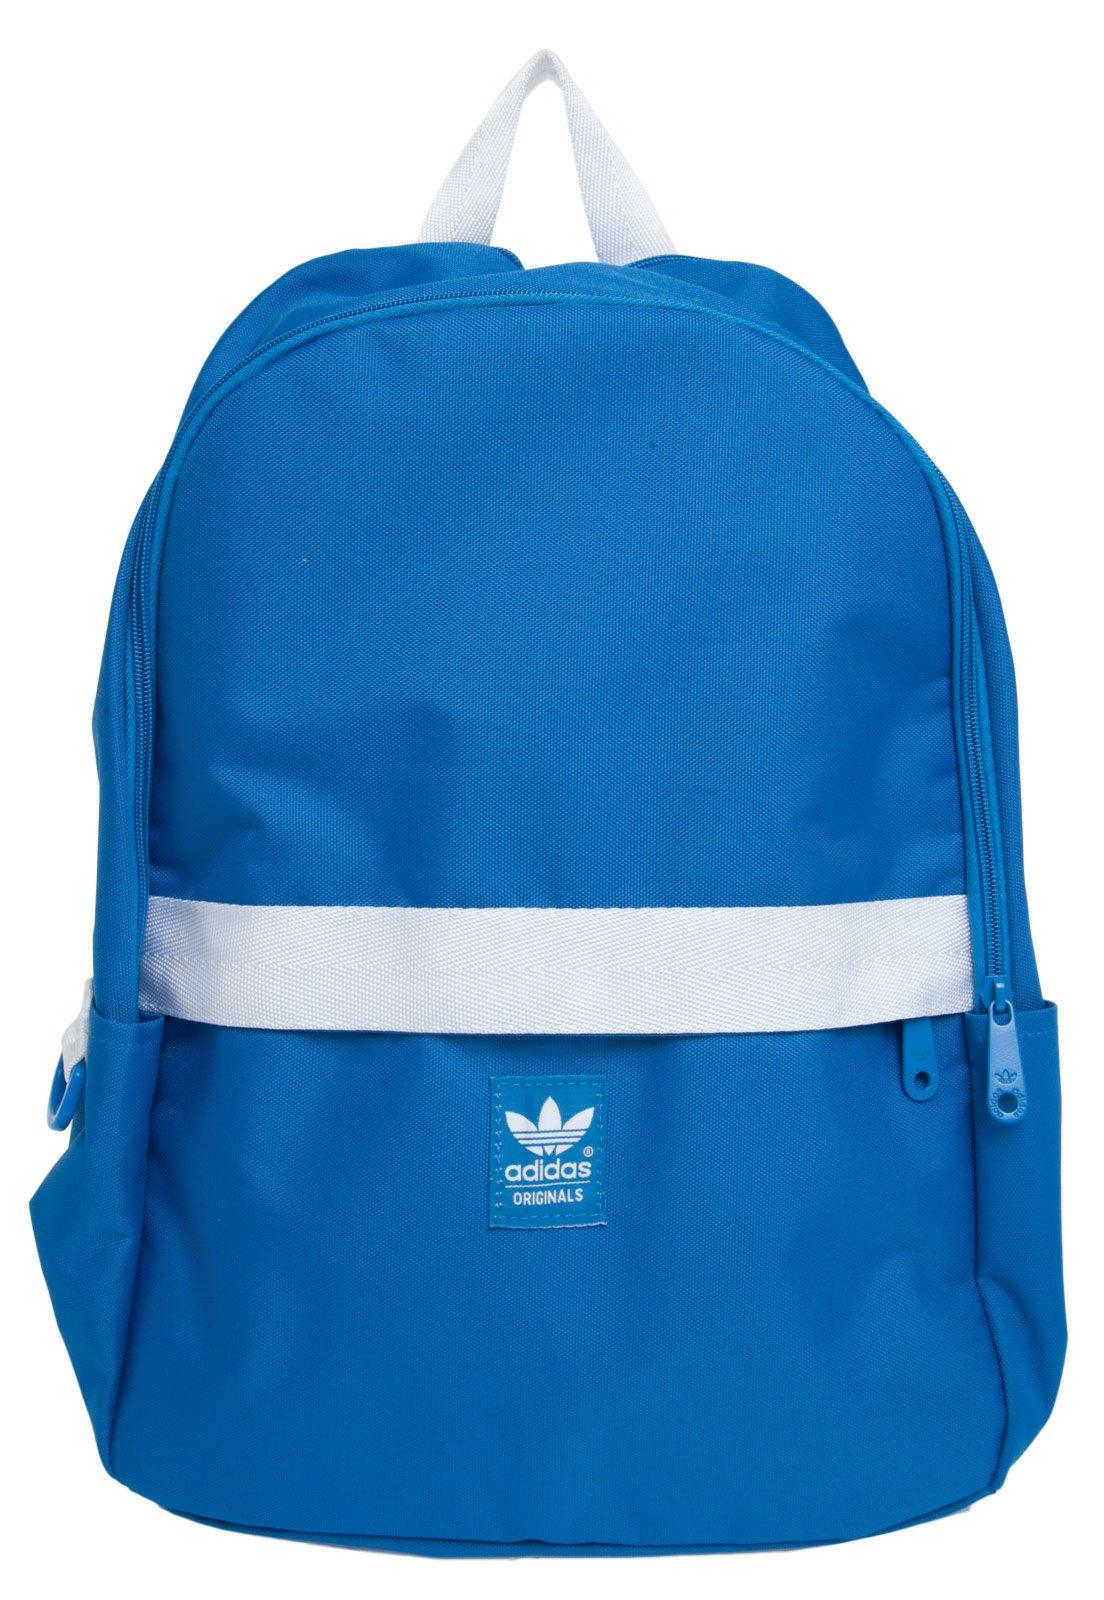 Adidas Adidas Azul Mochila Mochila Originals Azul Mochila Adidas Originals YI6mbf7gyv